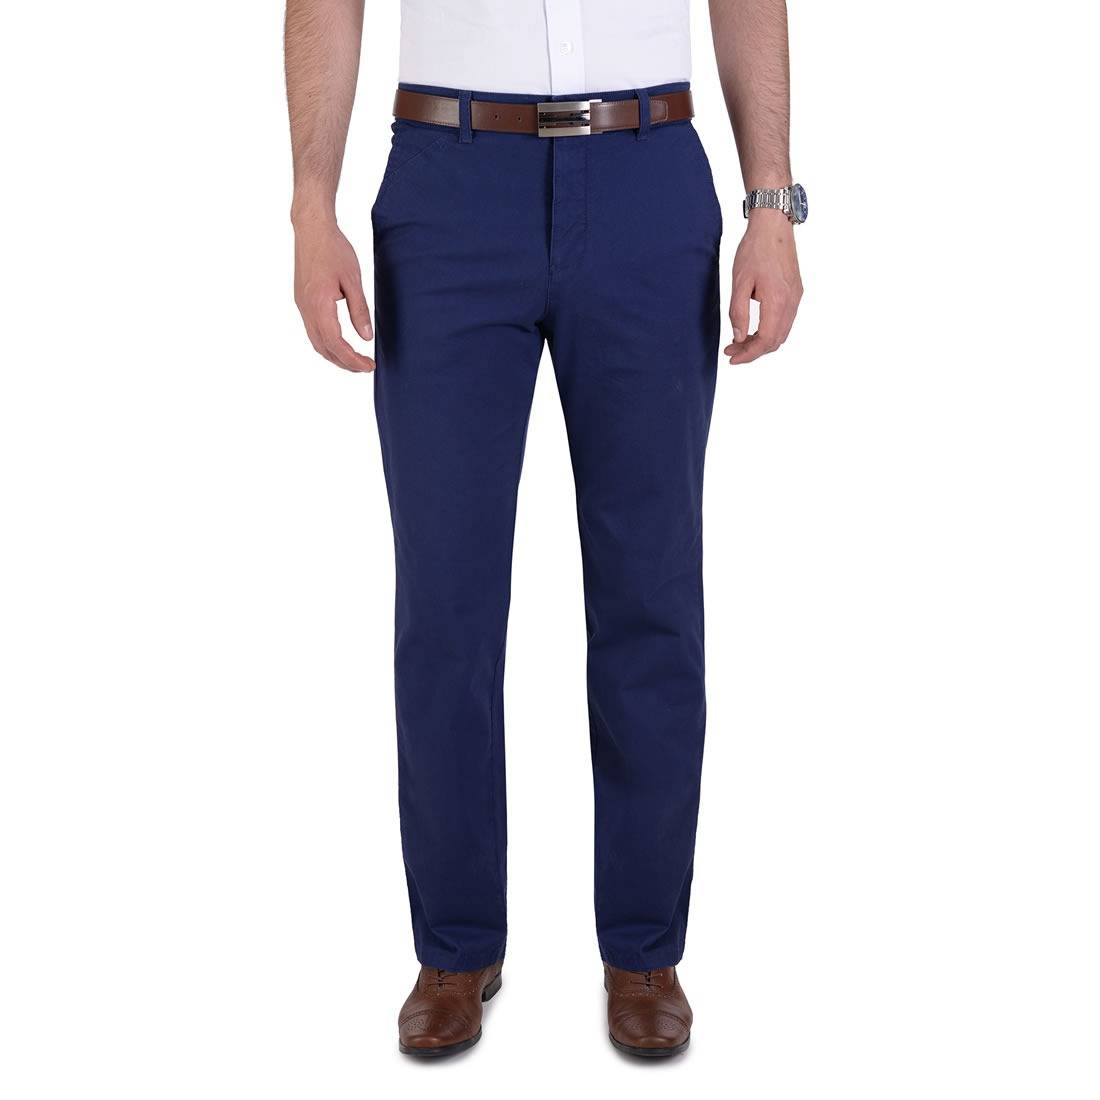 010808097719-01-Pantalon-Casual-Collection-Slim-Fit-Con-Elastano-Marino-yale